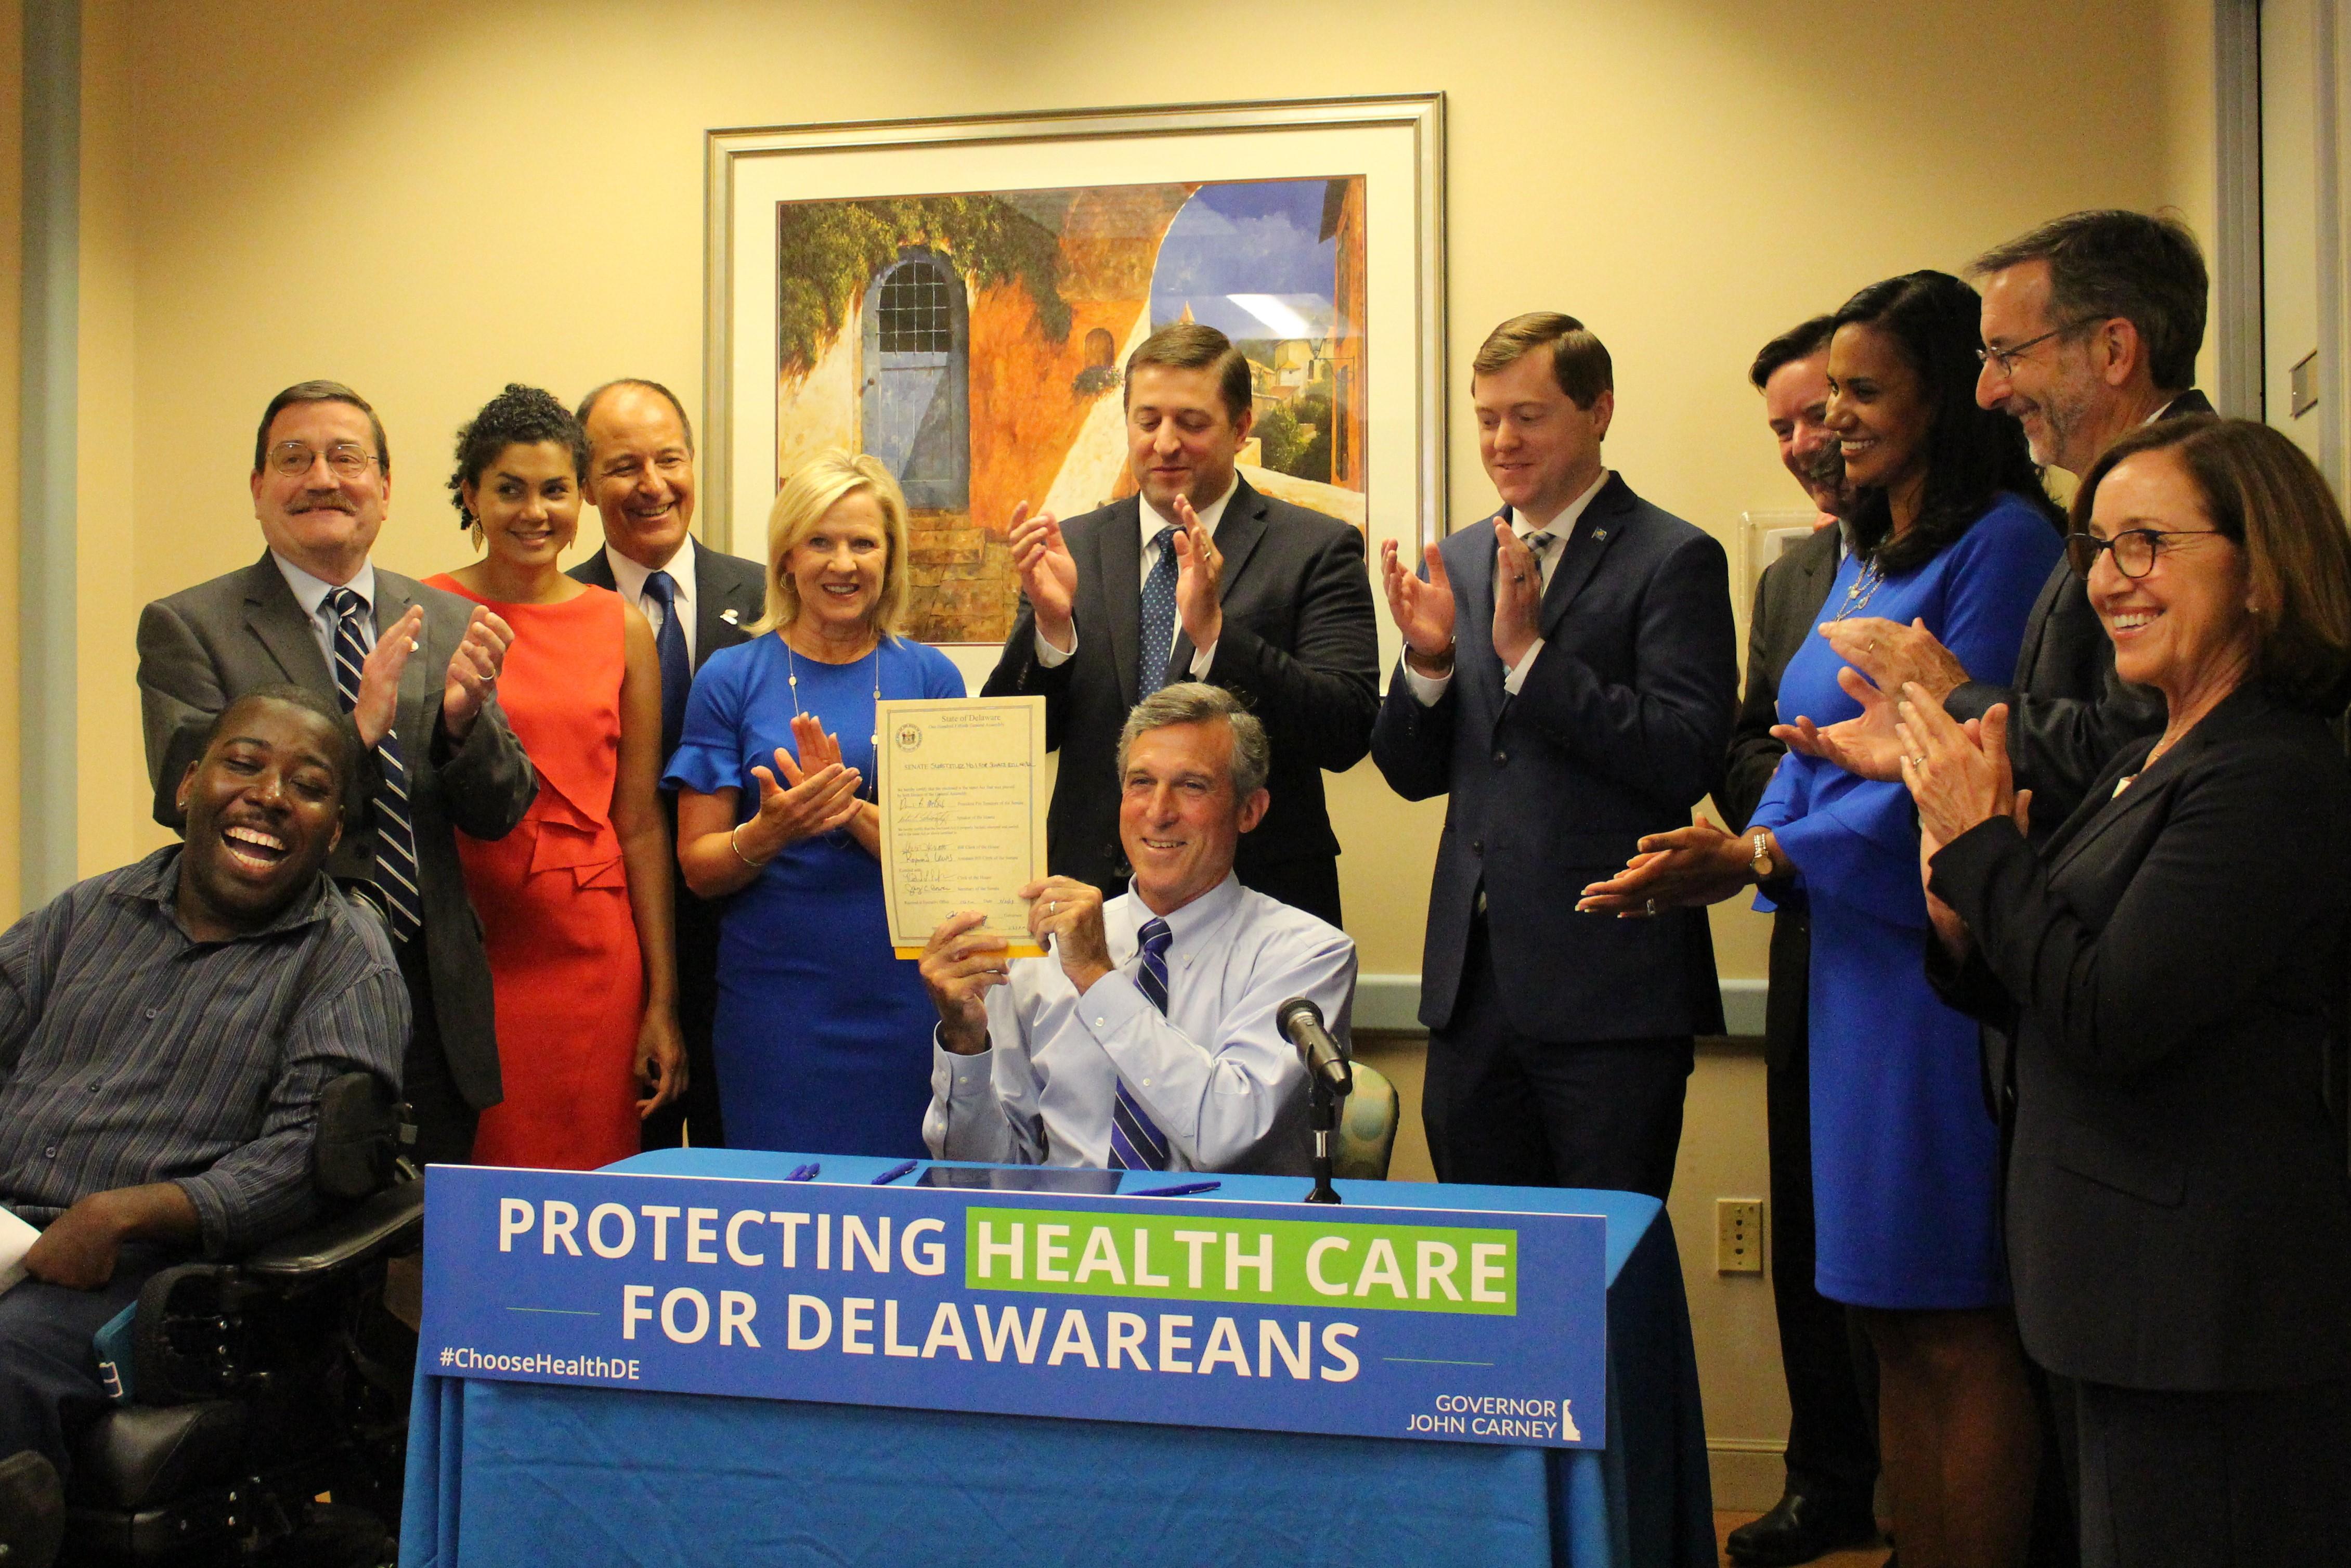 Governor Carney Signs Legislation Protecting Health Care for Delawareans